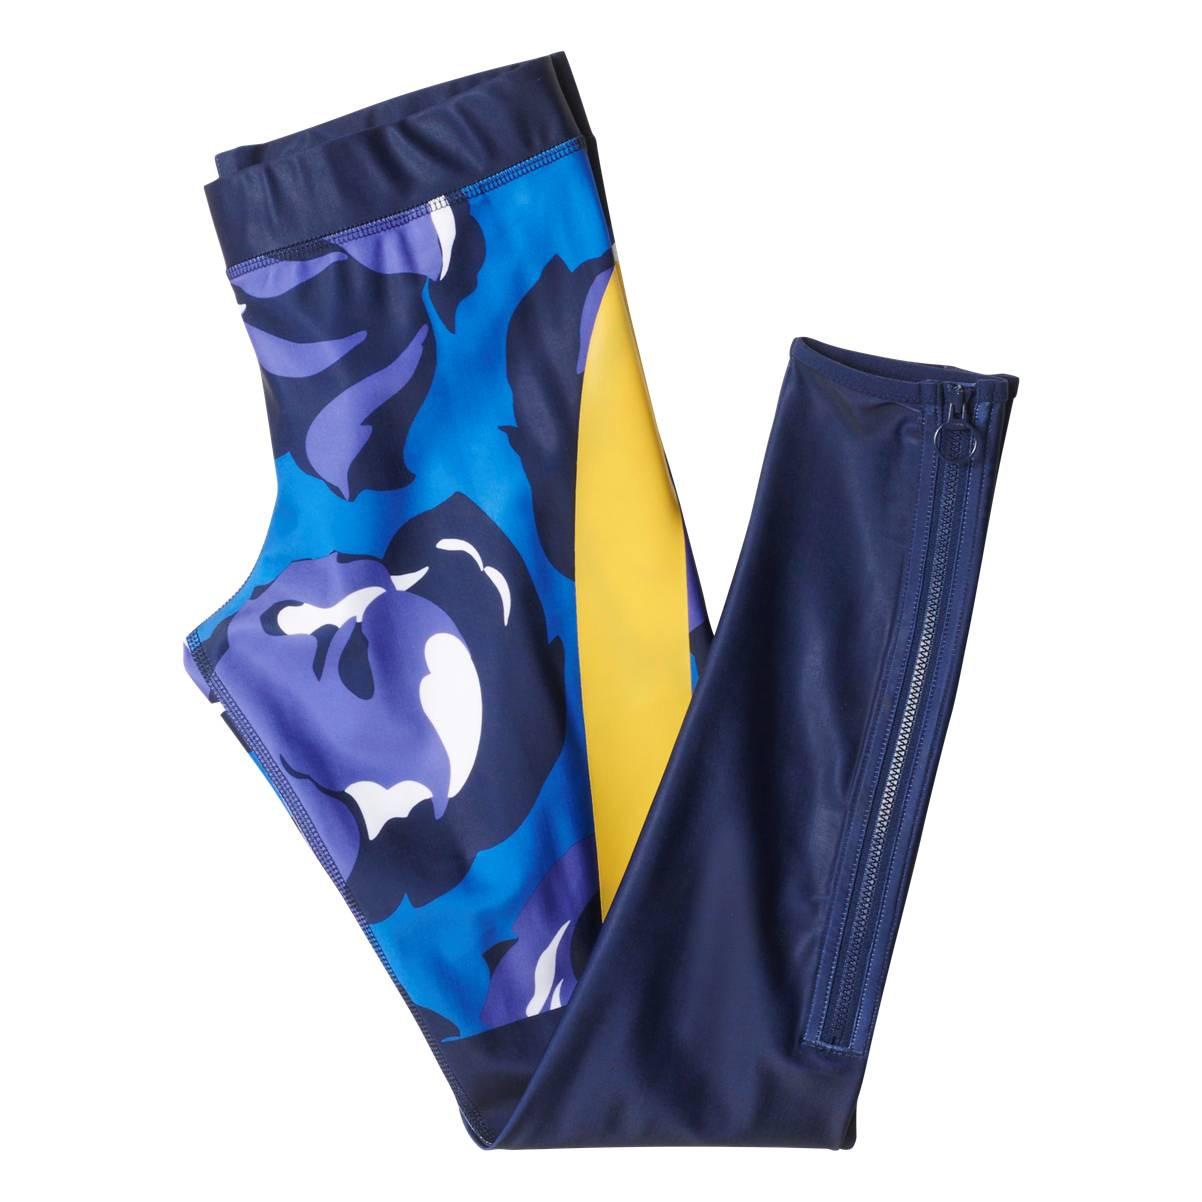 Новая коллекция adidas by Stella McCartney Fall/Winter 2015